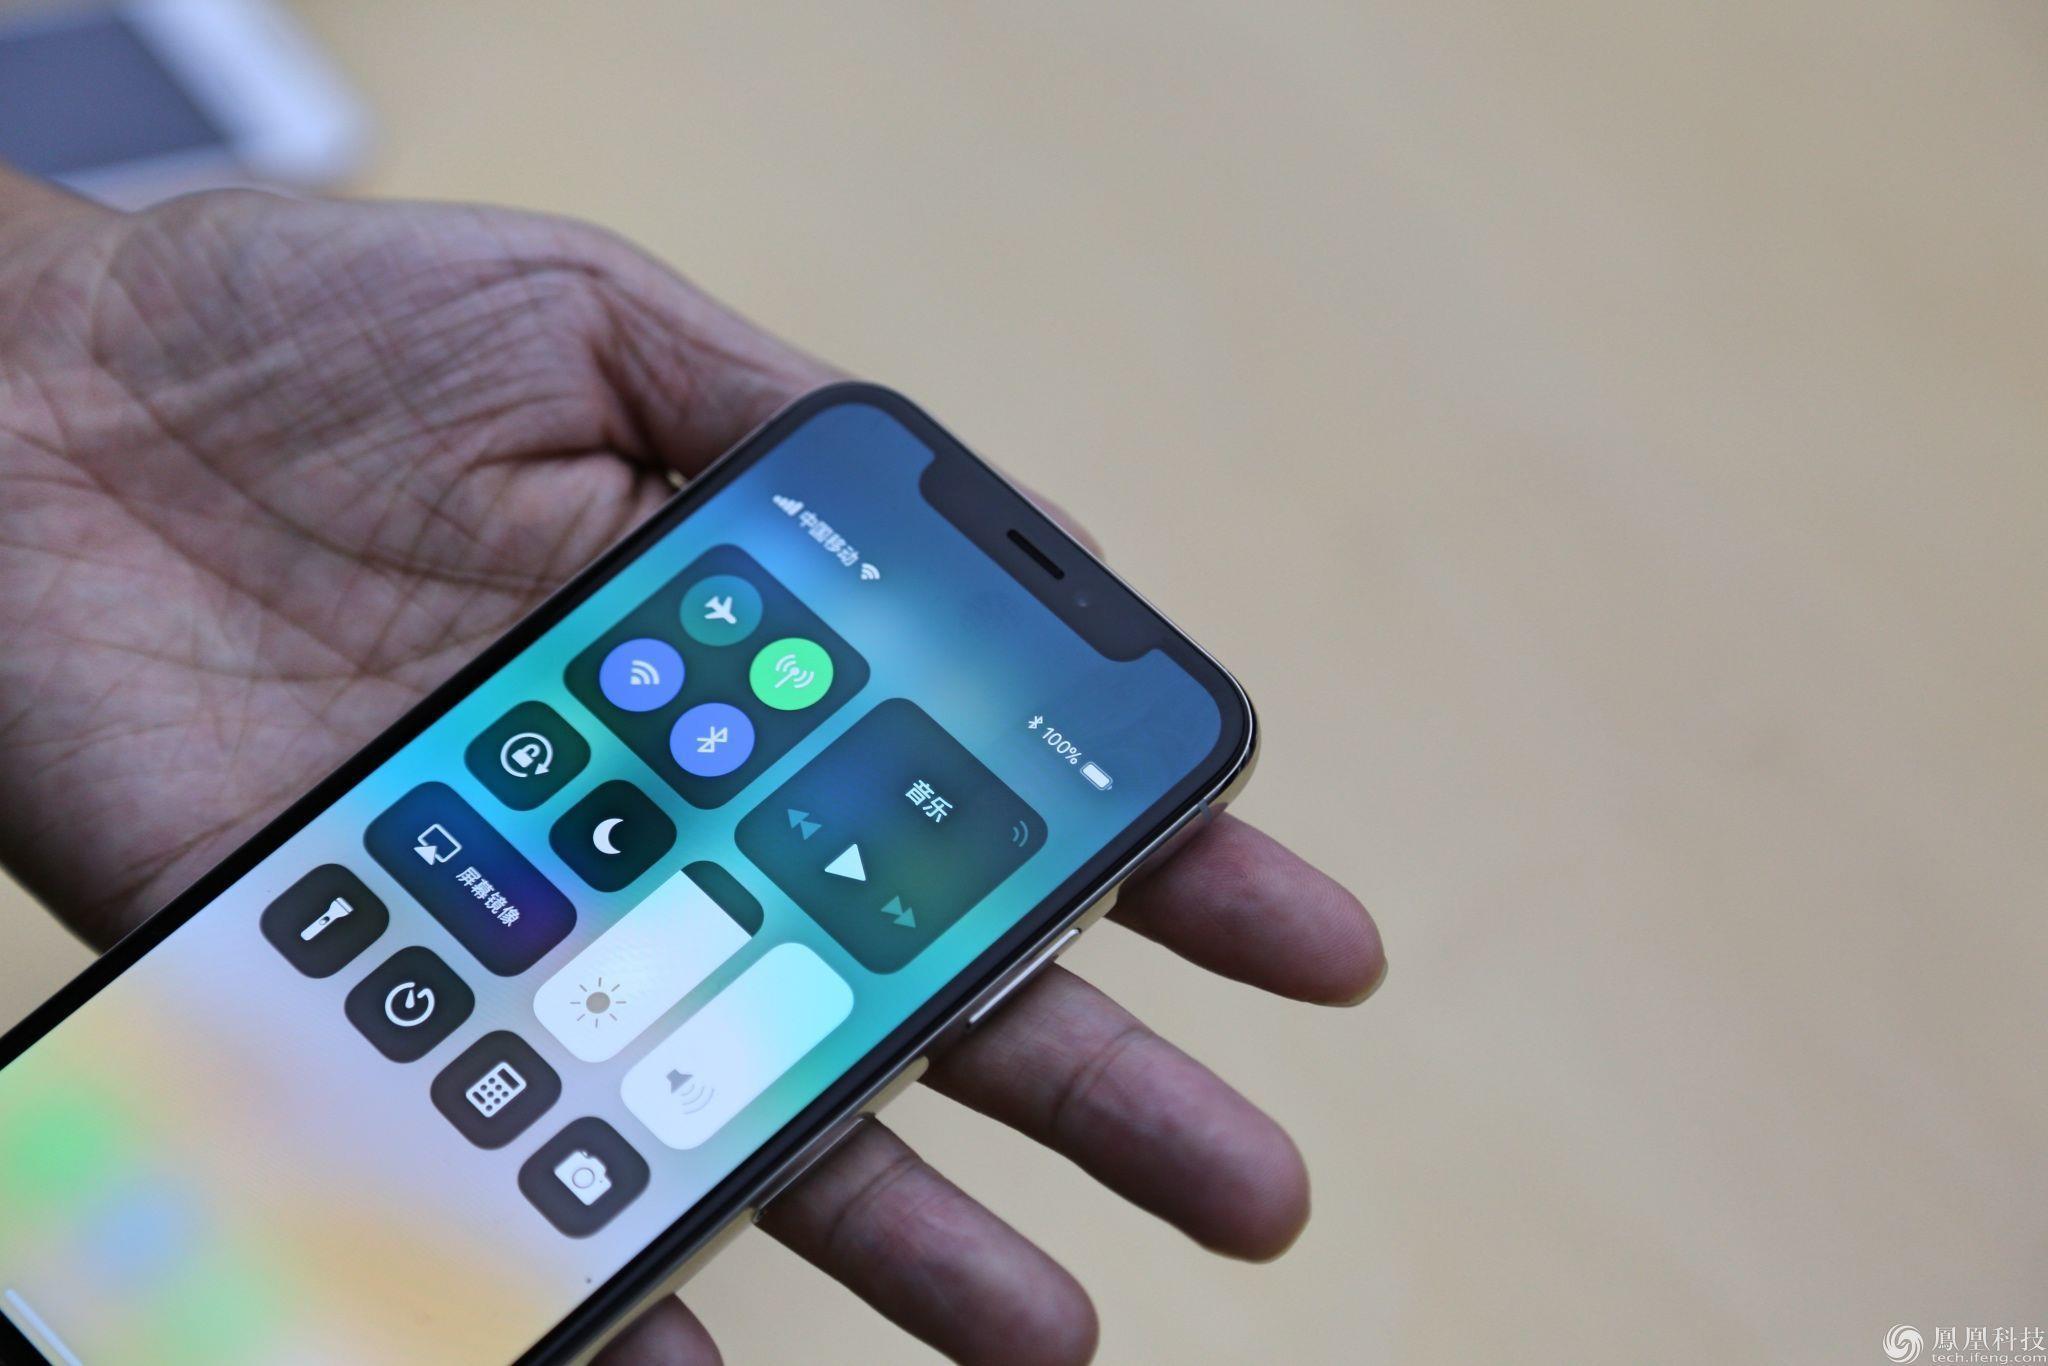 iPhoneX256GB顶配评测 9688元到底值不值